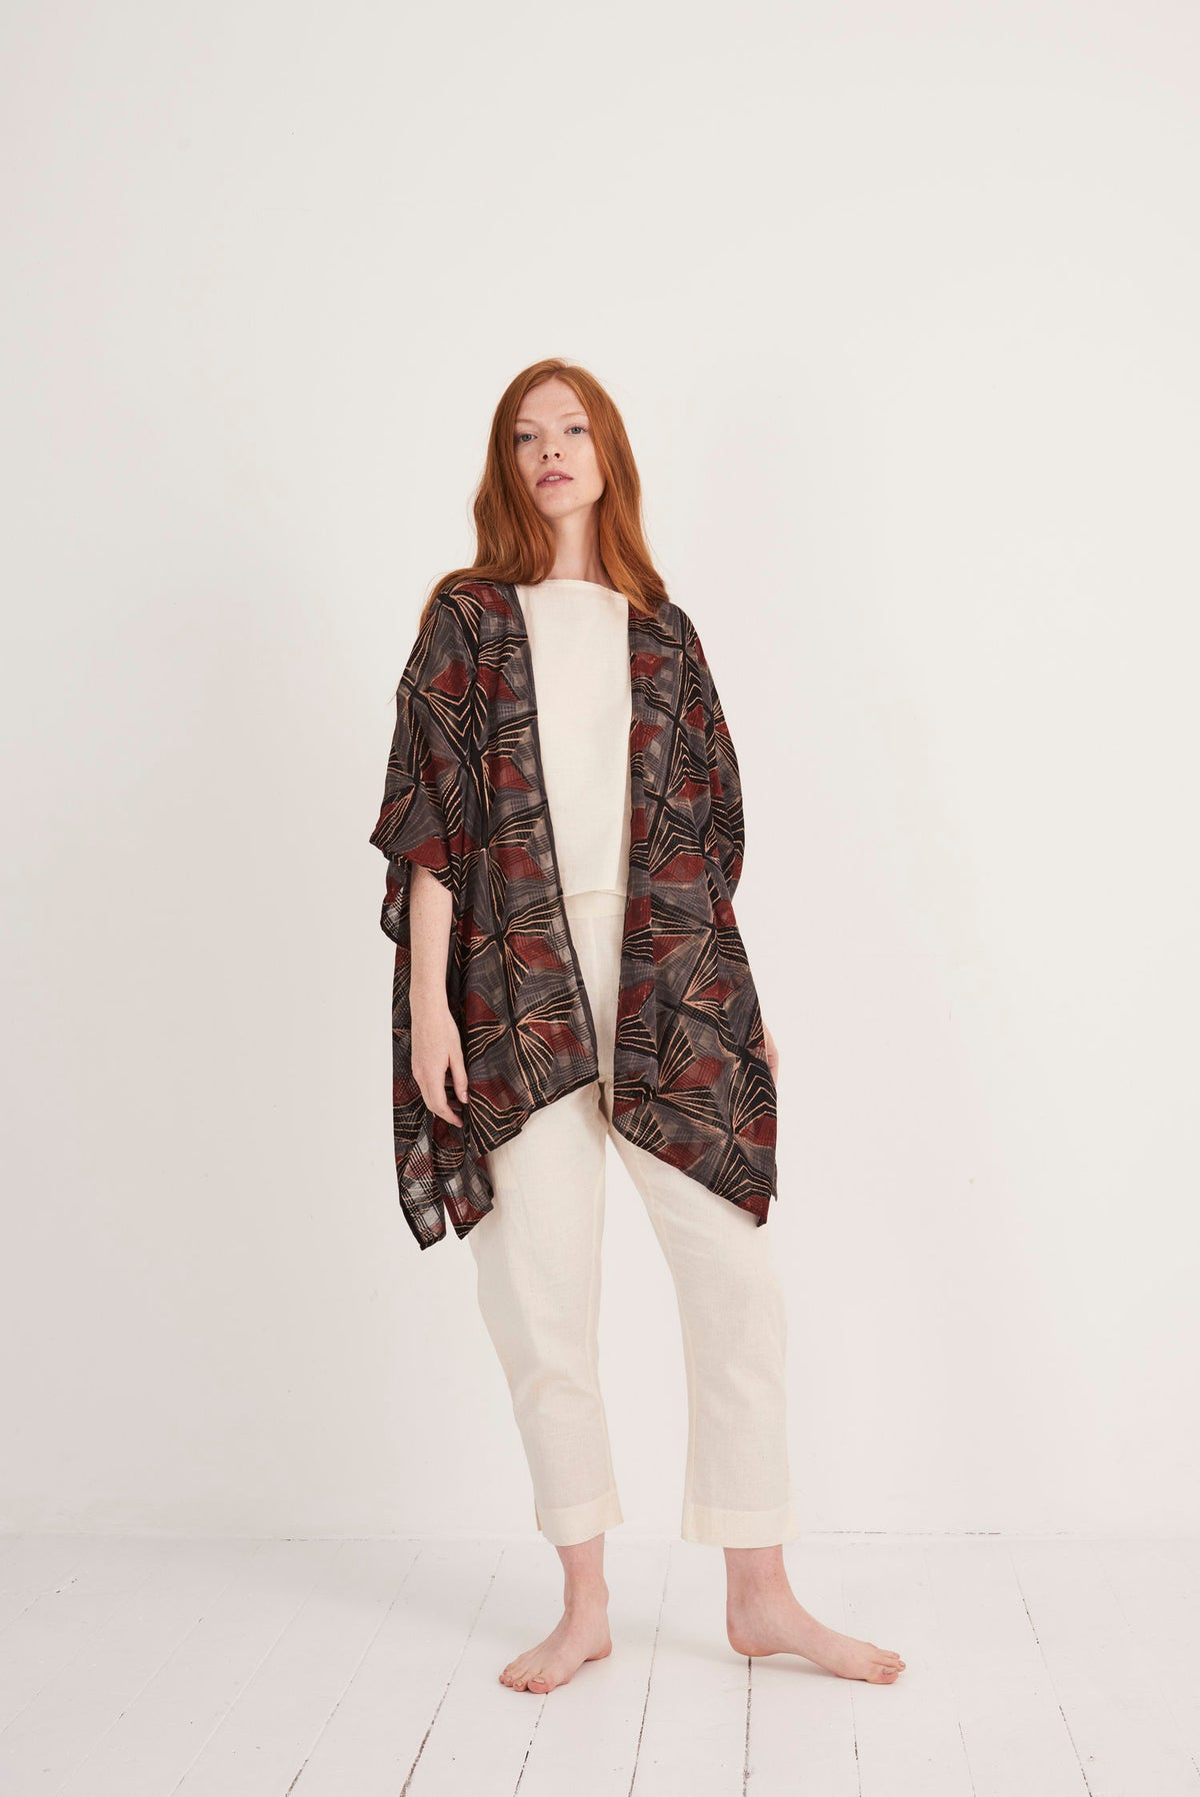 Image of Maelu Short Kimono - Nina Print